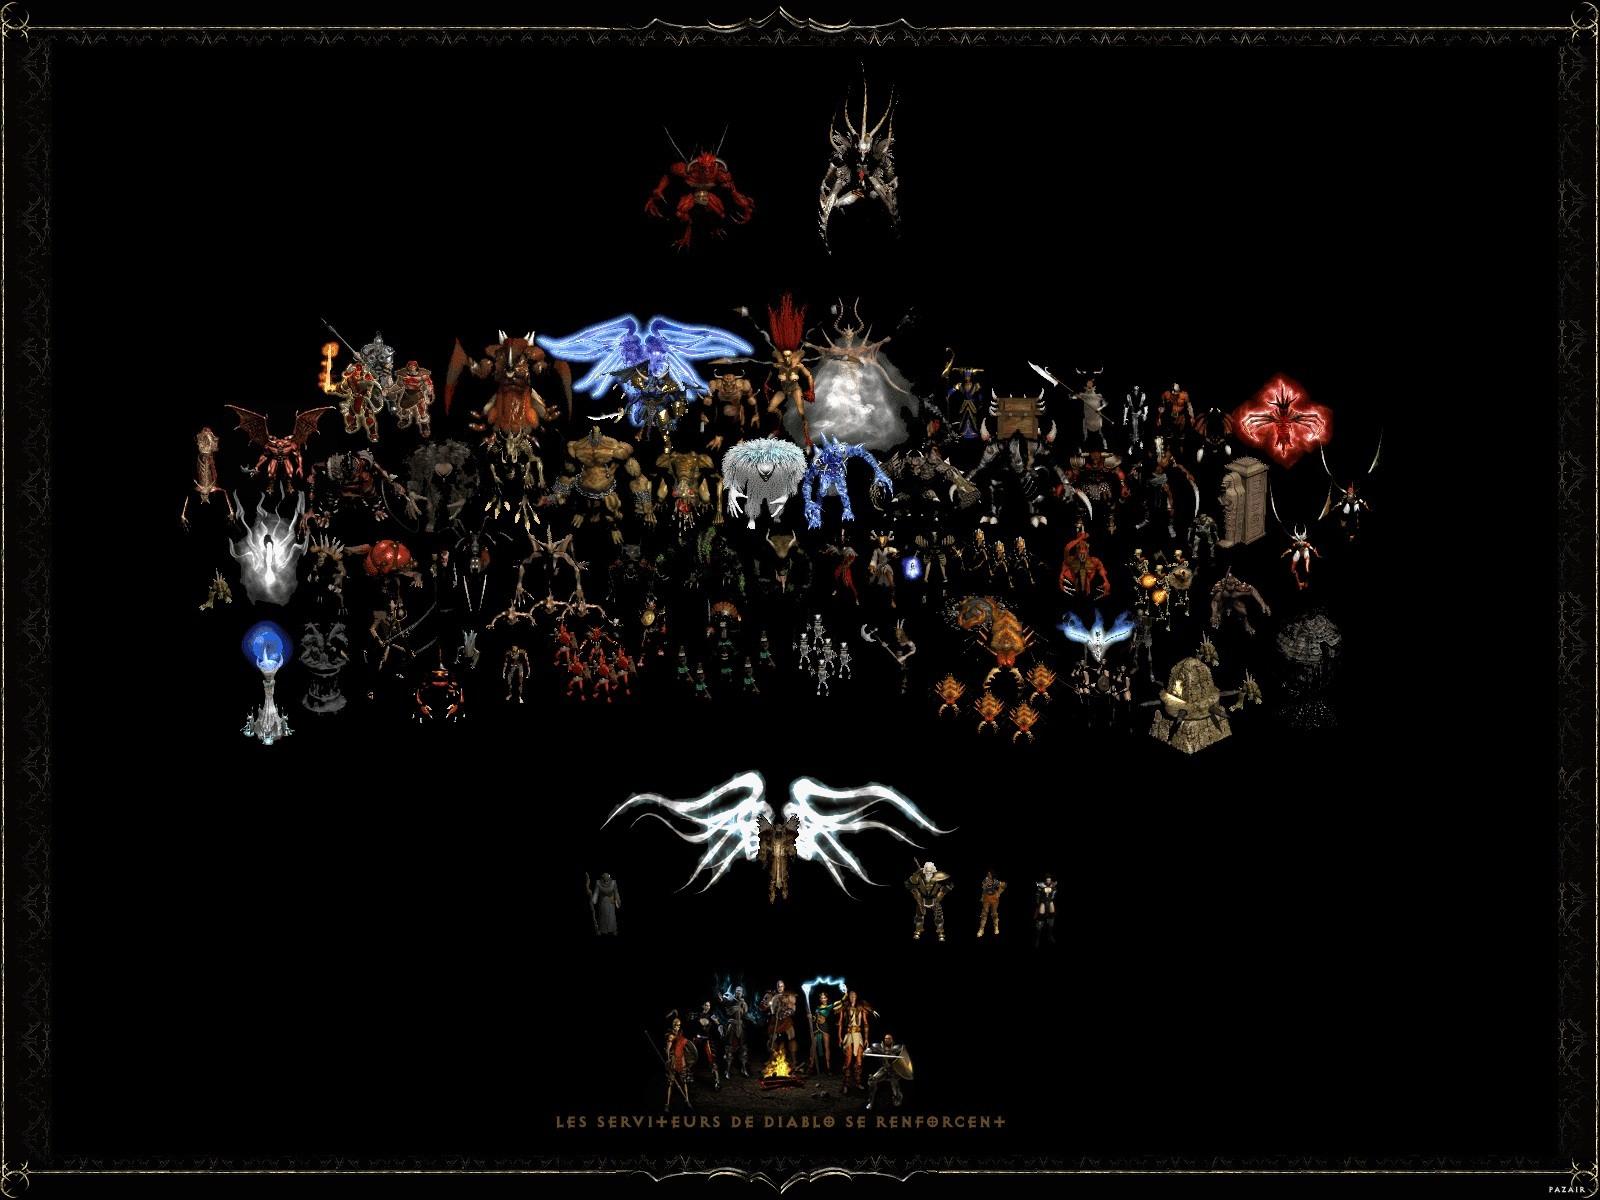 Diablo 2 wallpaper wallpapersafari - Diablo 2 lord of destruction wallpaper ...